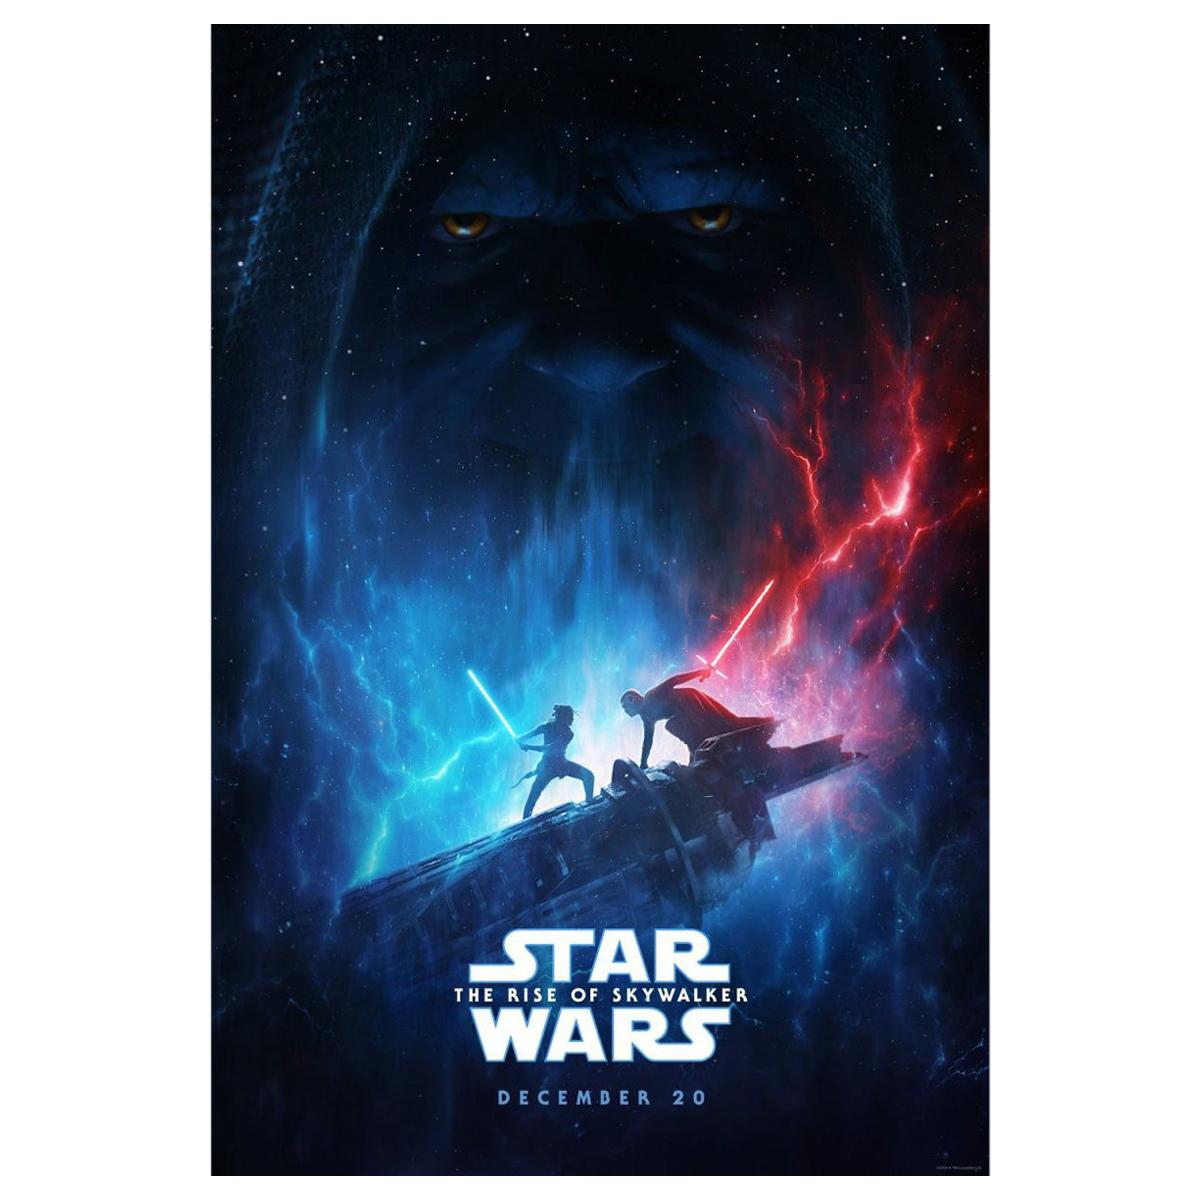 Star Wars The Rise Of Skywalker '2019' Poster